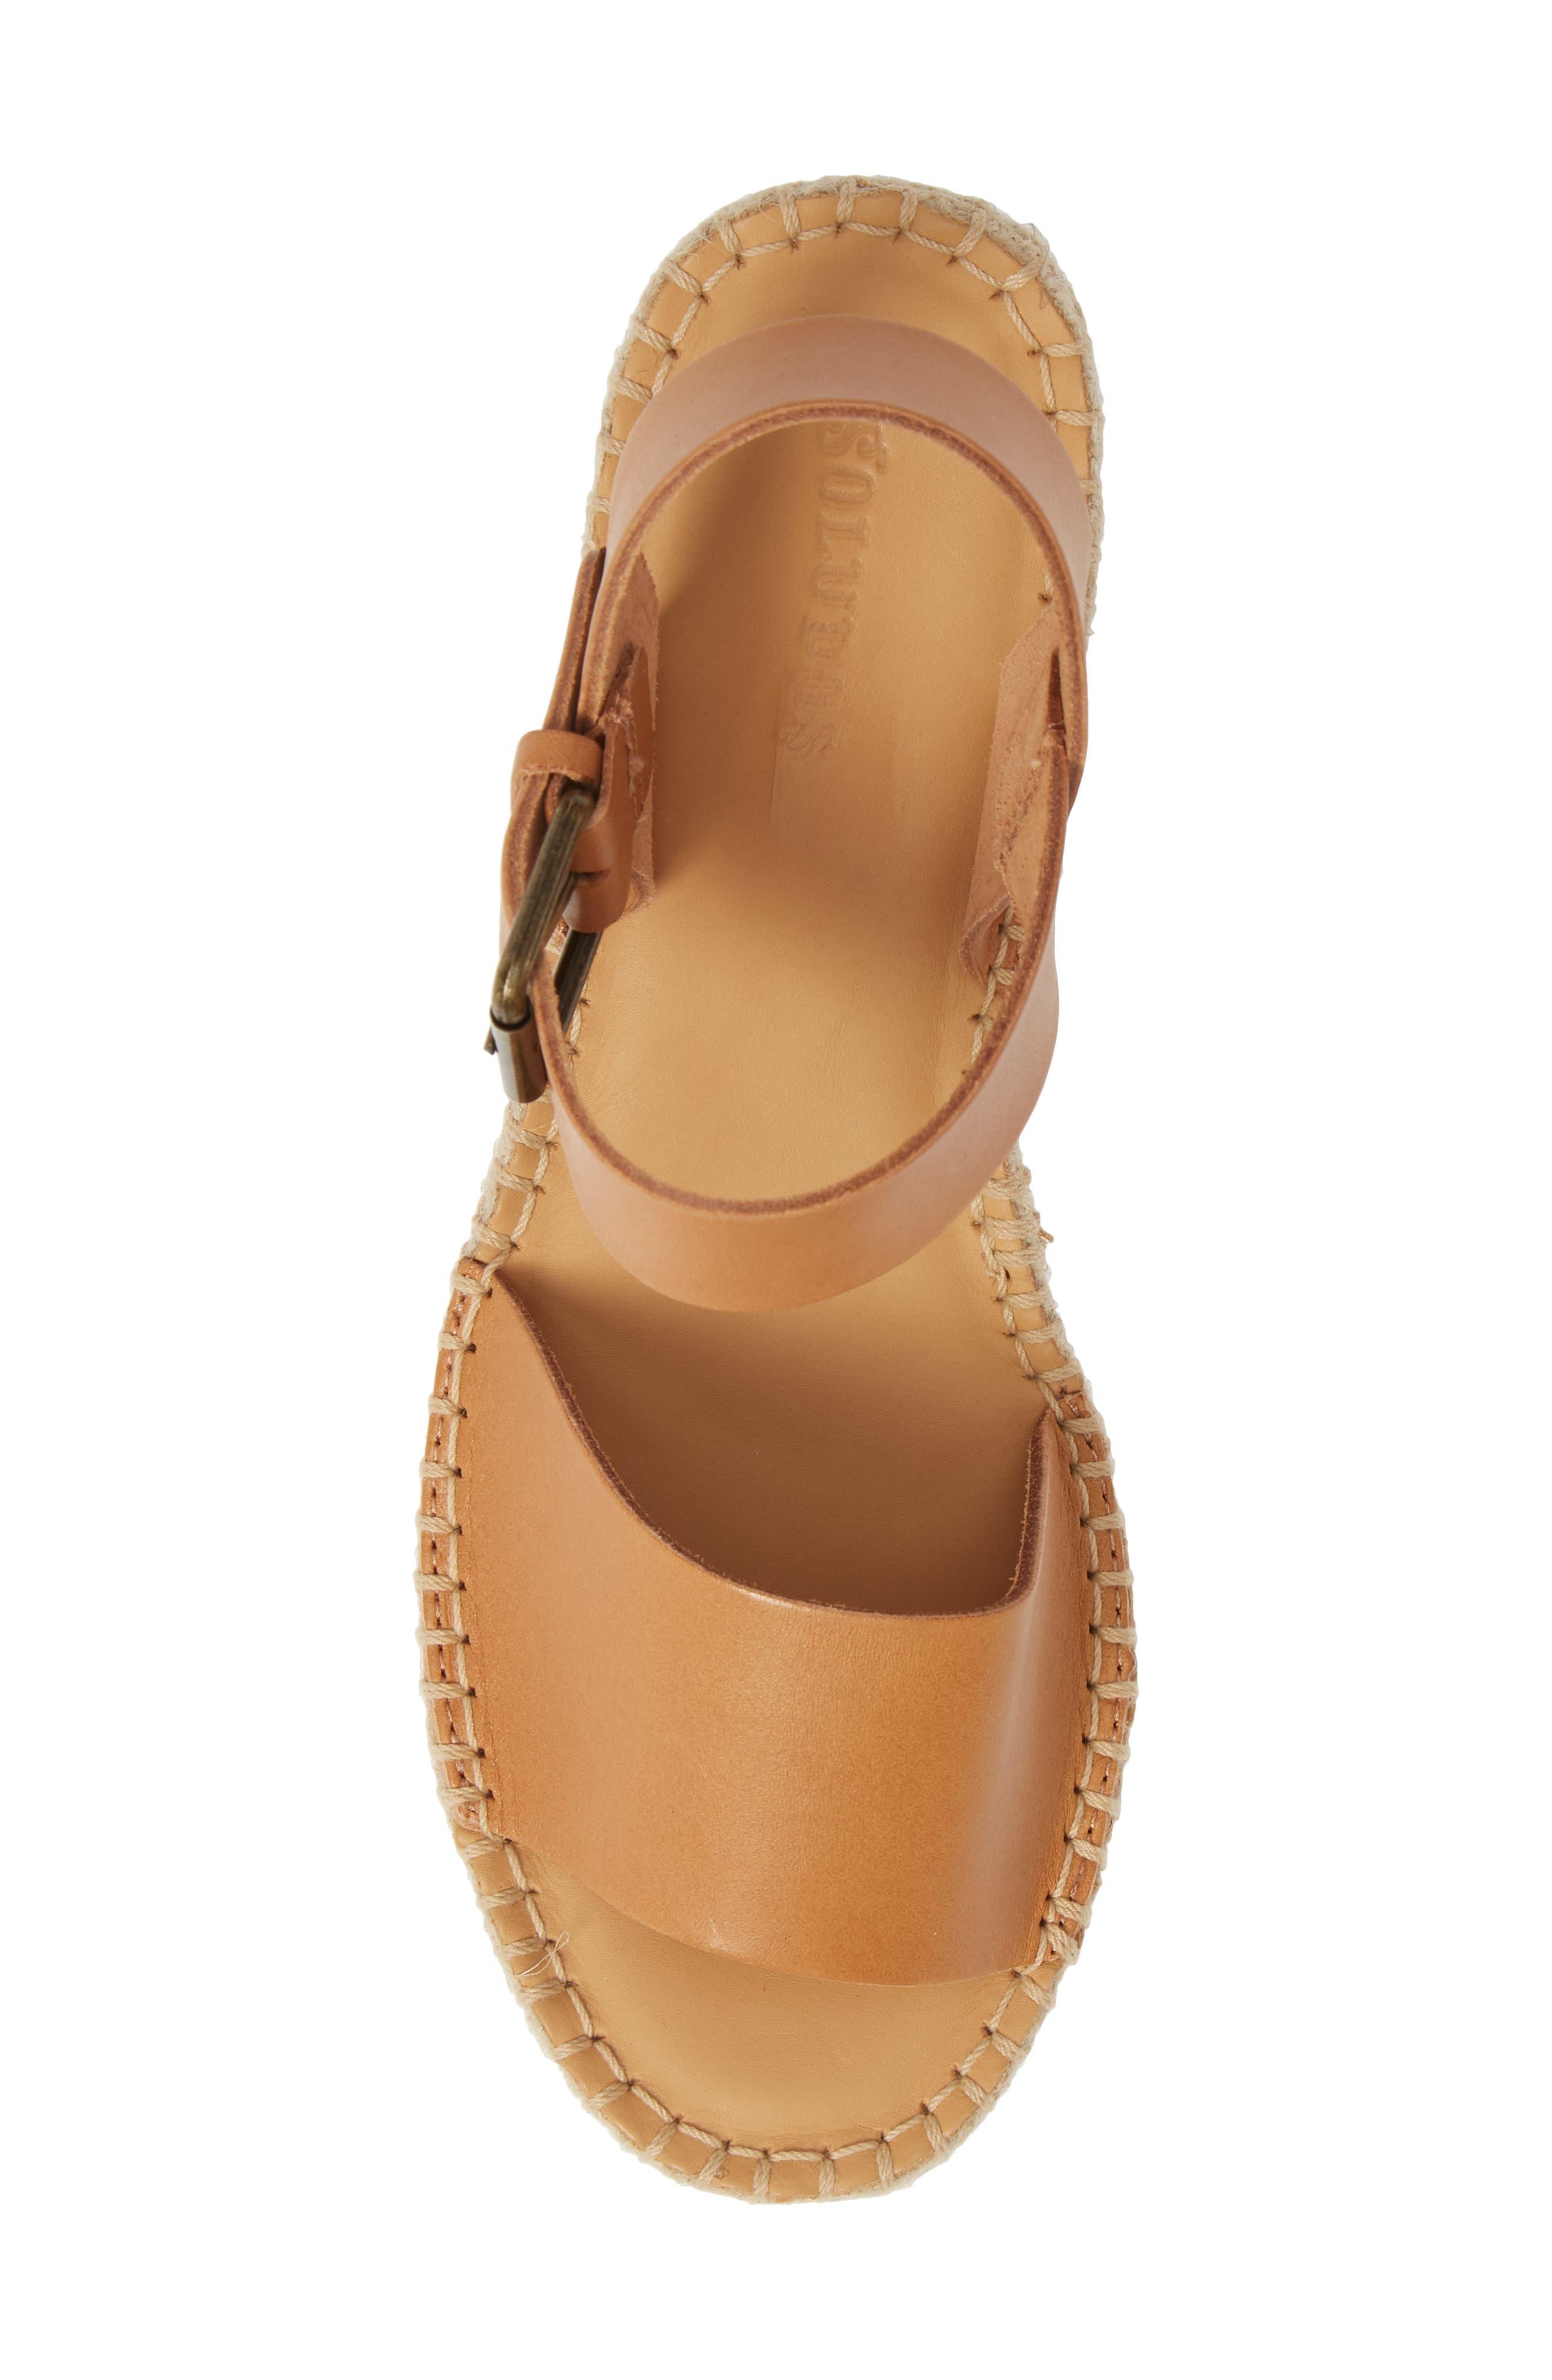 SOLUDOS, Minorca Platform Wedge Sandal, Alternate thumbnail 5, color, NUDE LEATHER